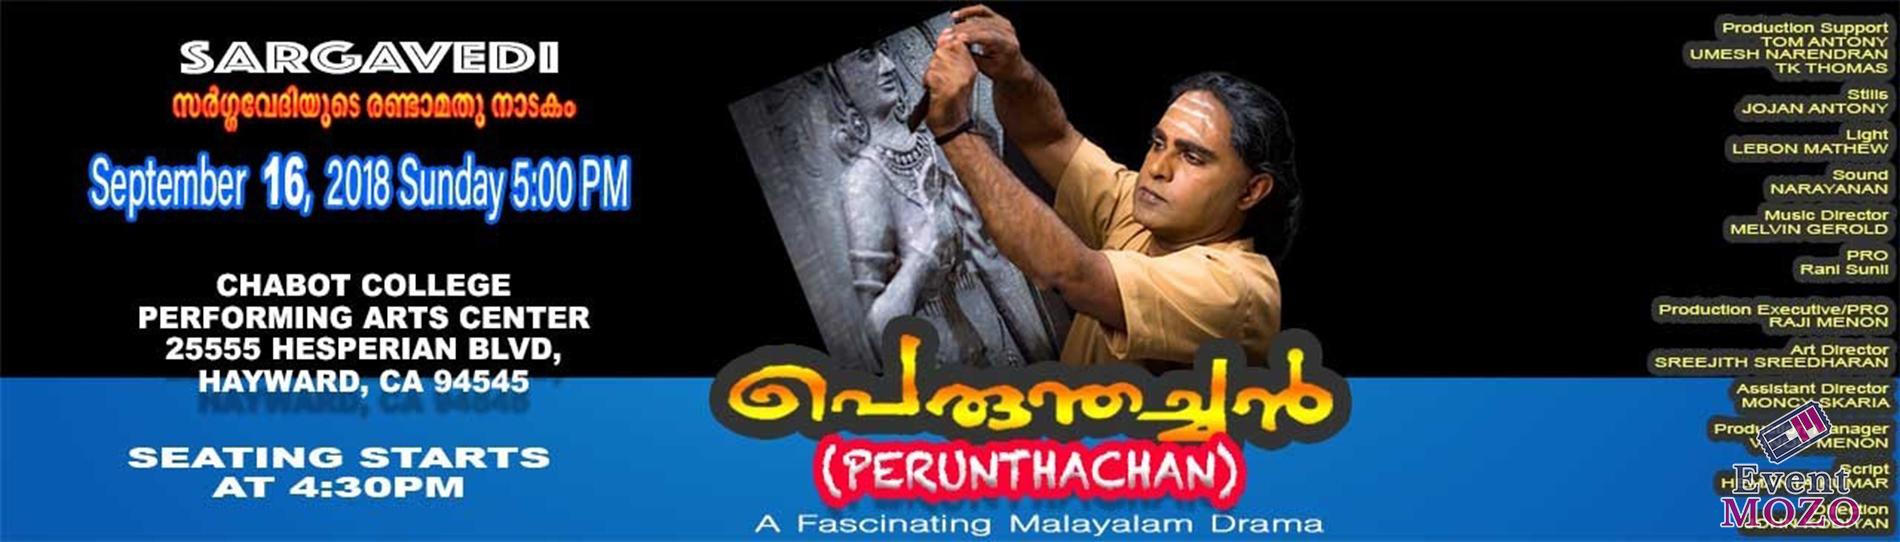 EventMozo Malayalam Drama Perunthachan by Sargavedi Bay Area